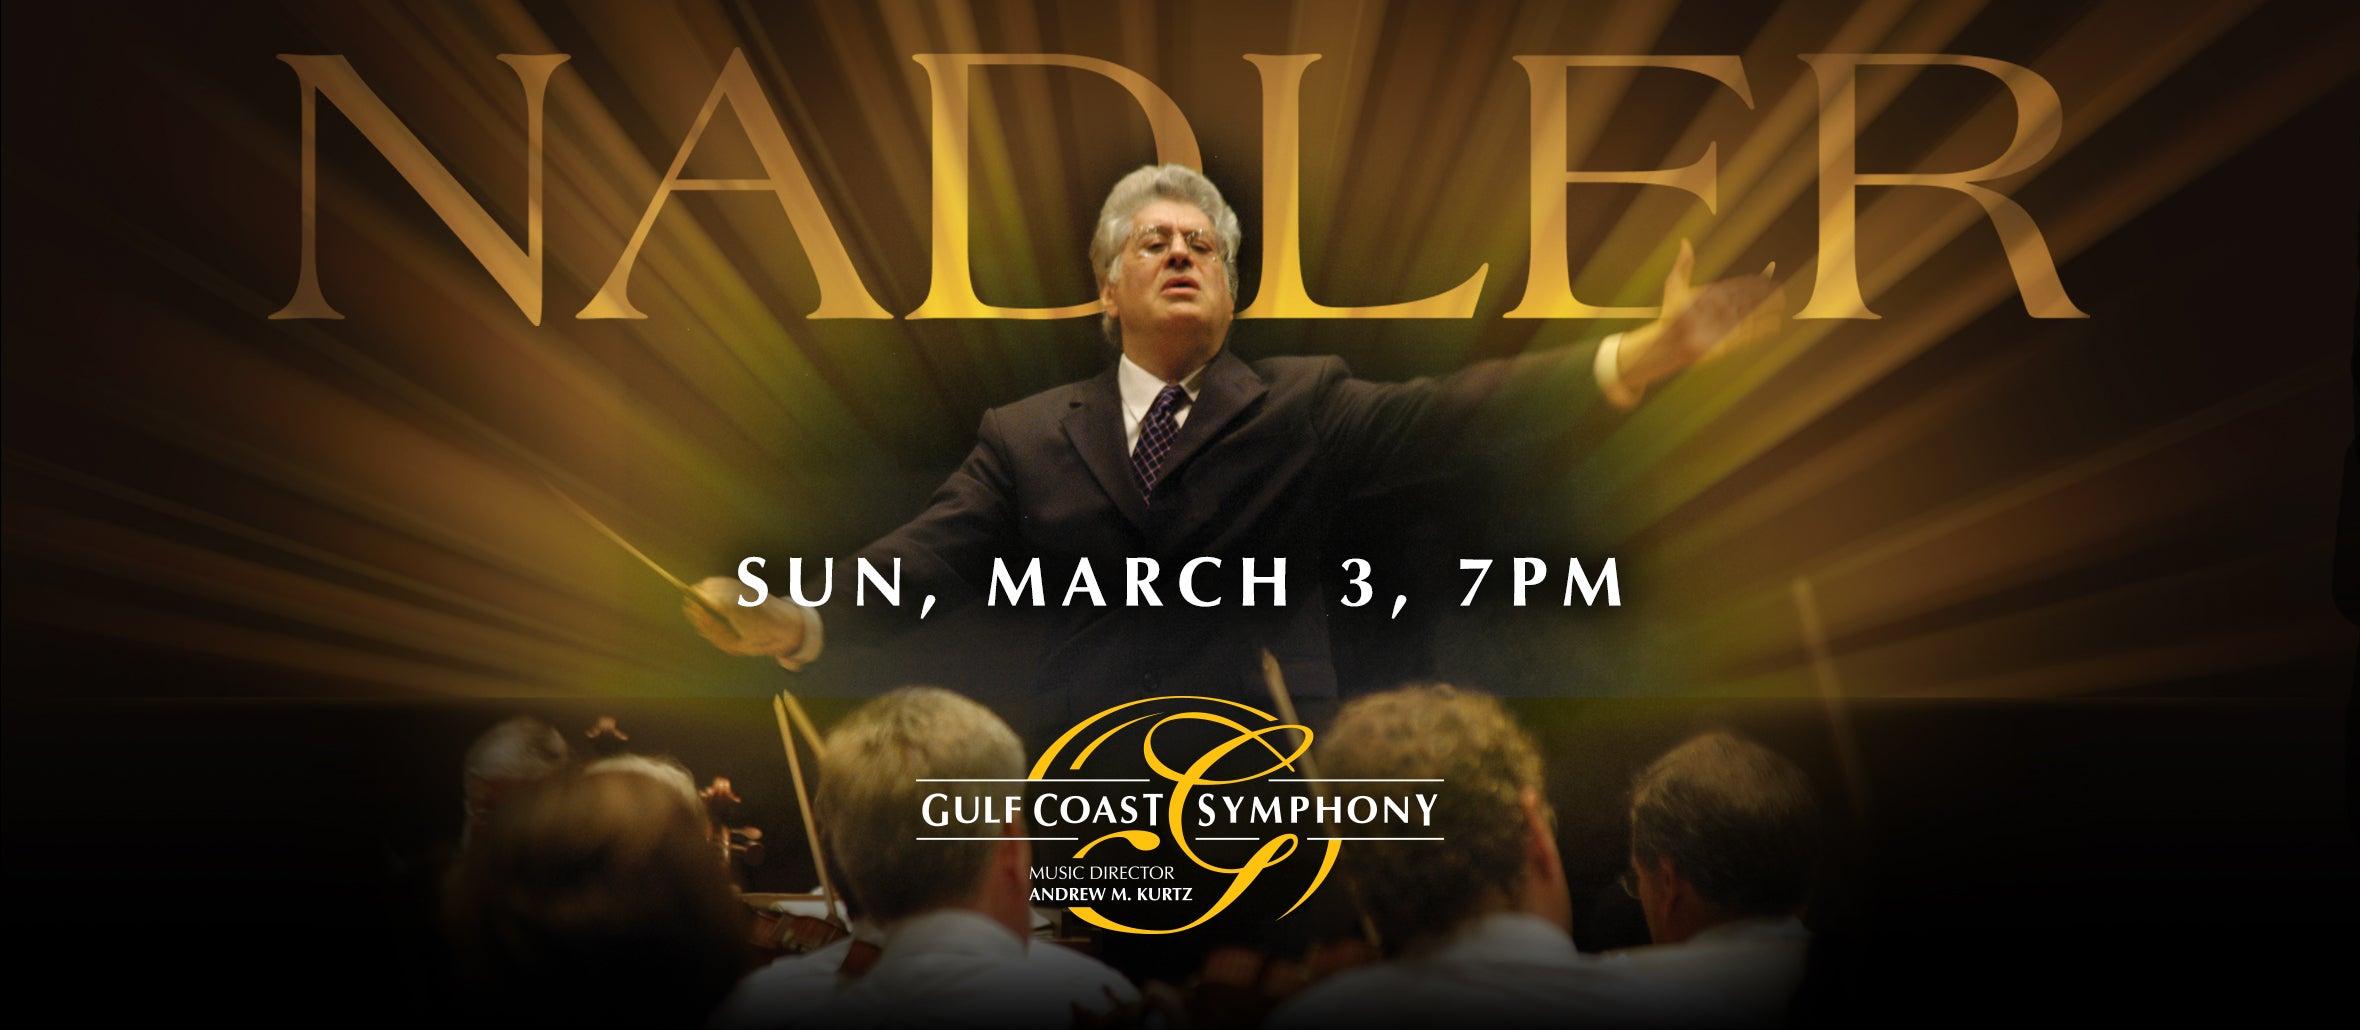 Gulf Coast Symphony: Paul Nadler